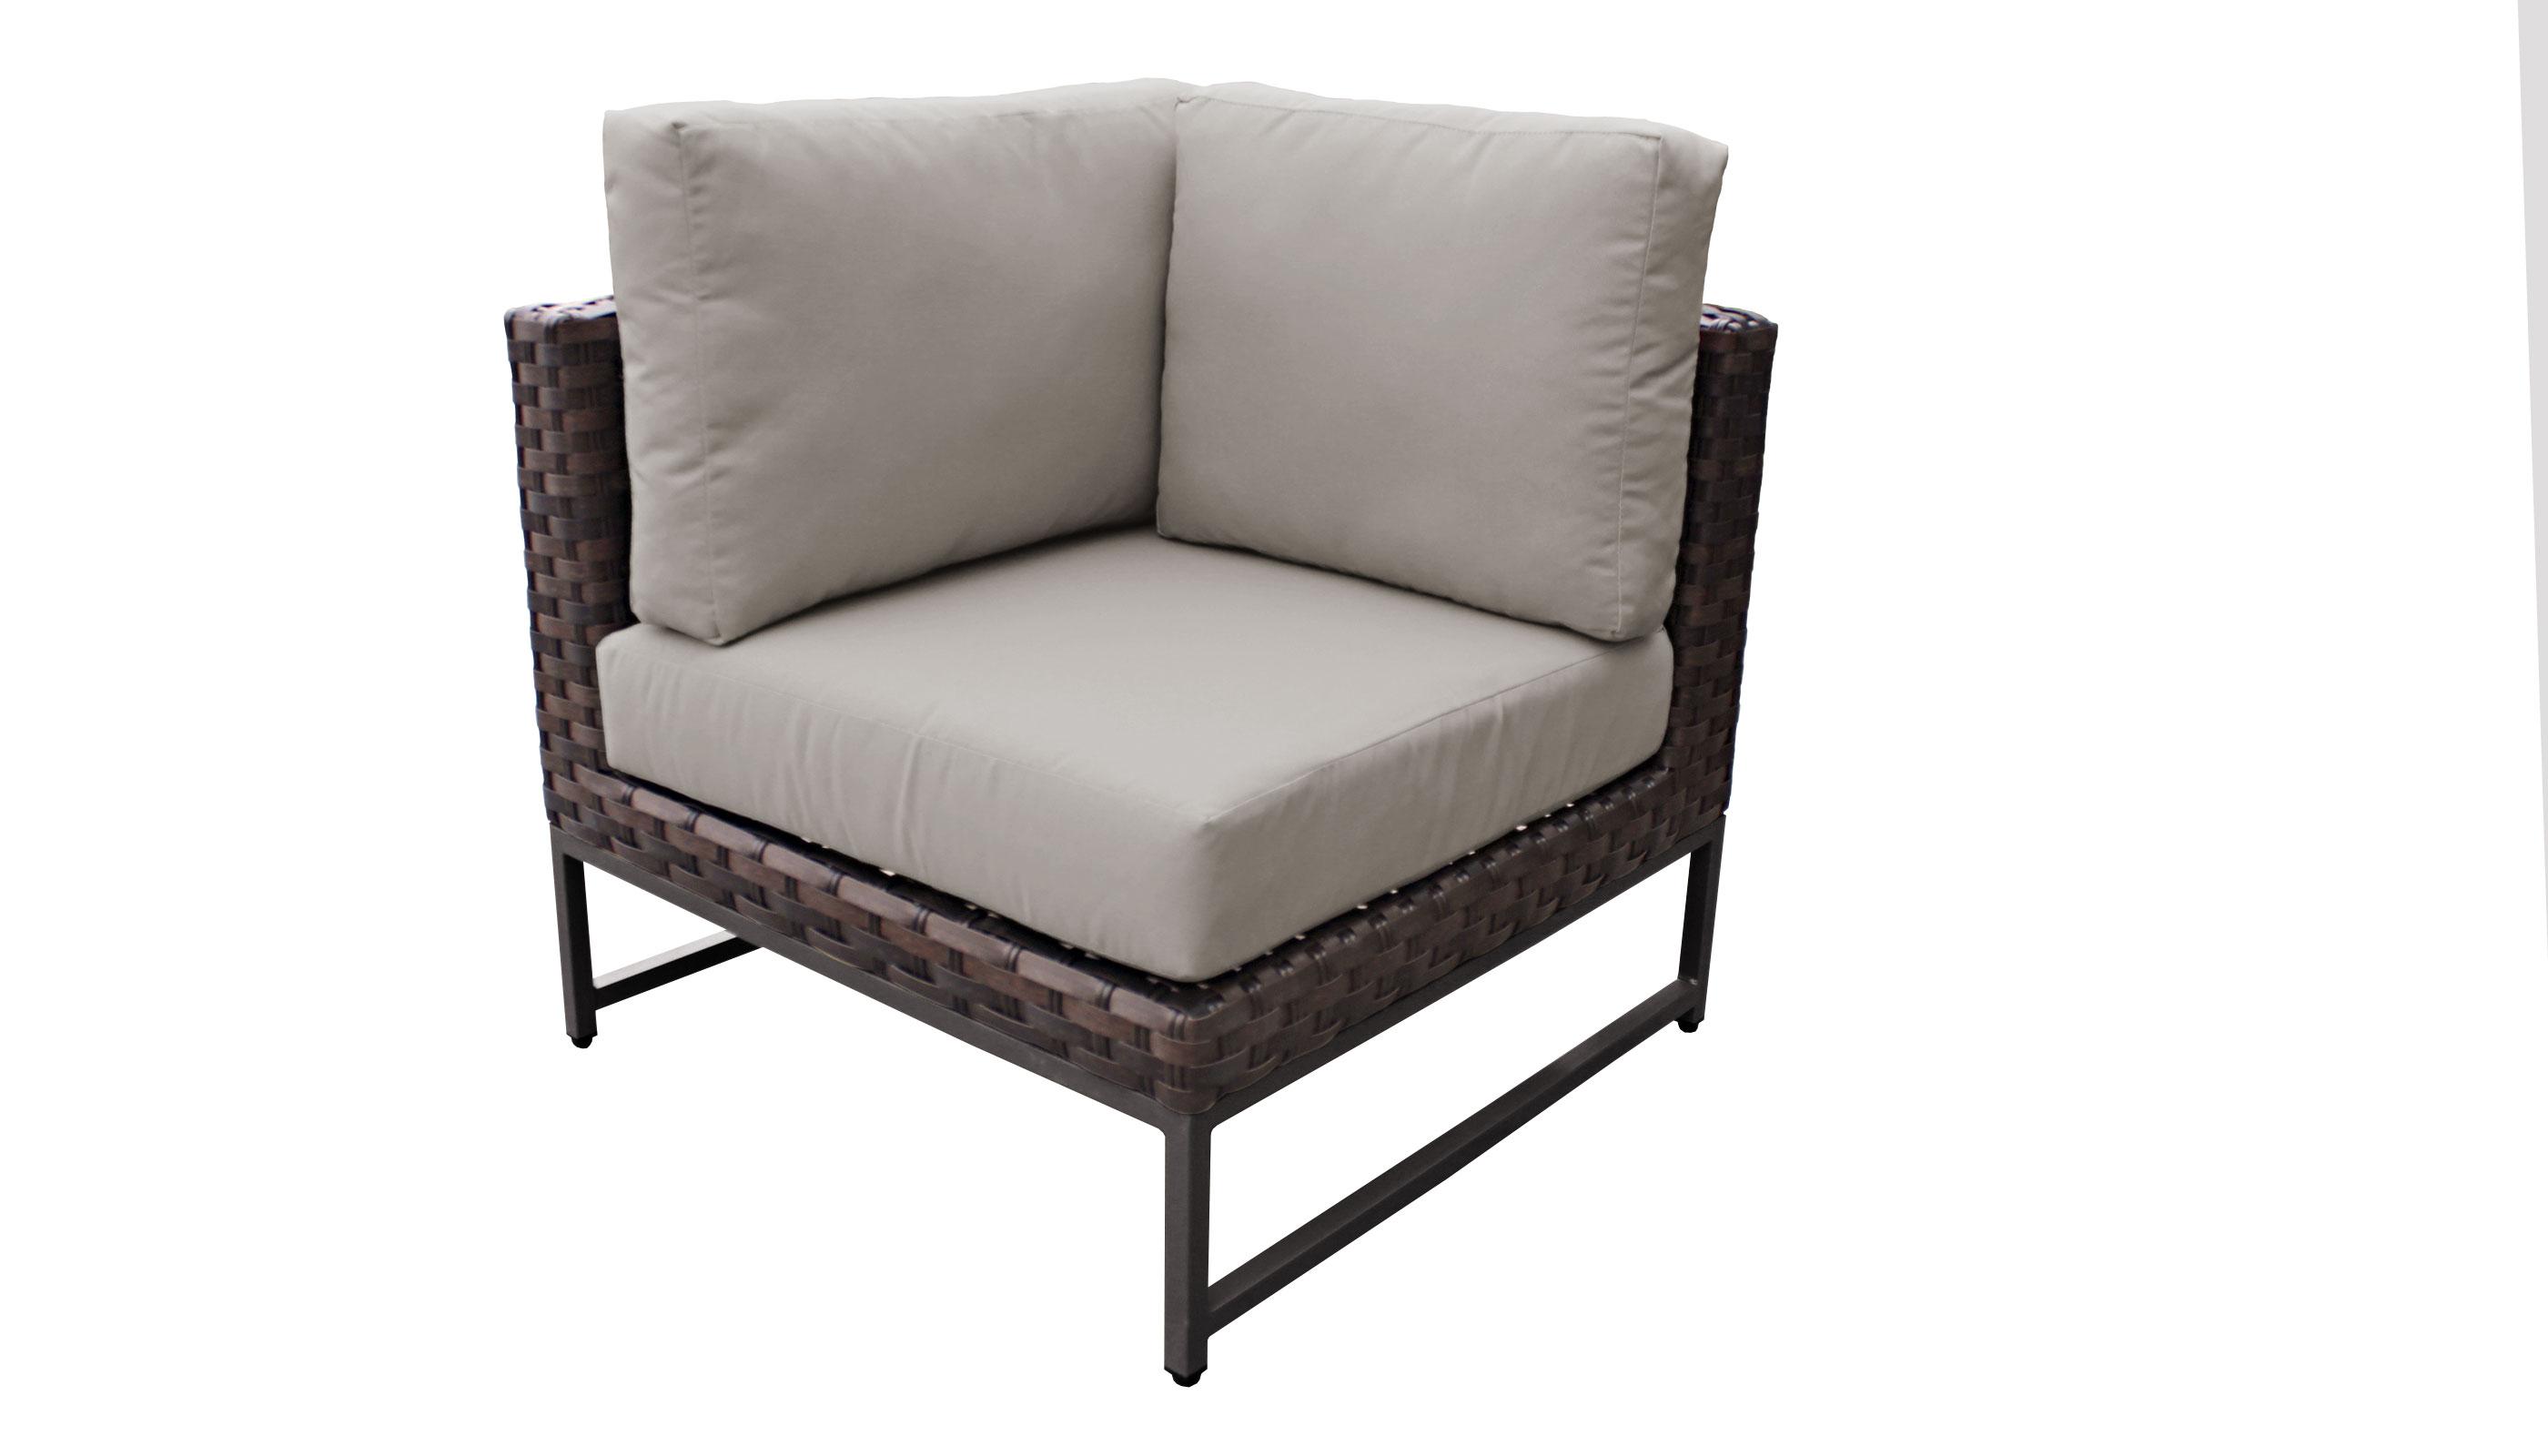 Barcelona 2 Piece Outdoor Wicker Patio Furniture Set 02a - TK Classics